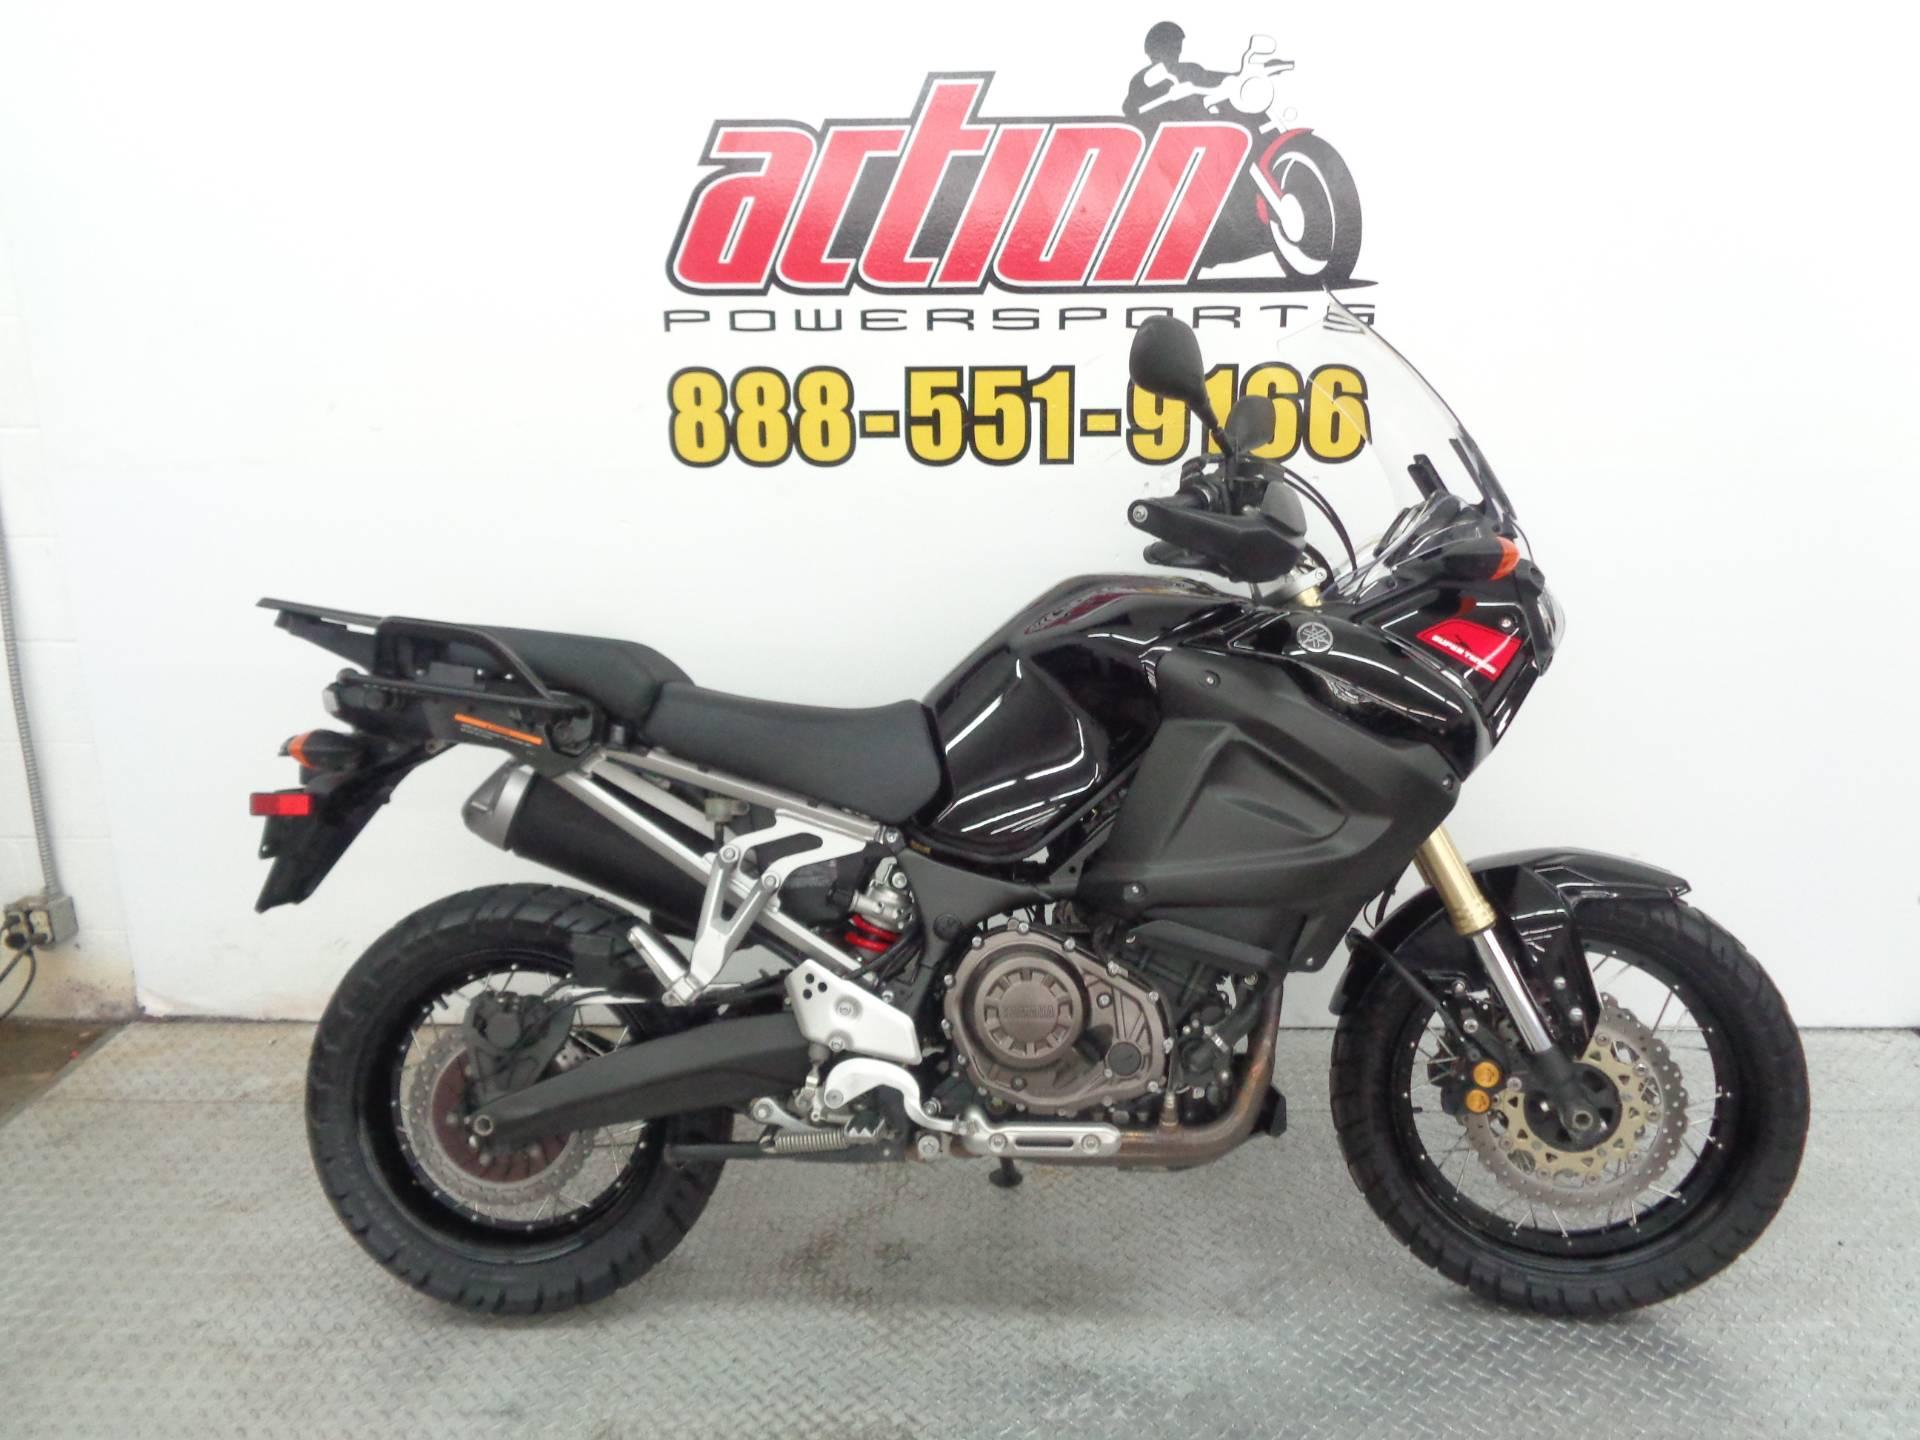 2012 Yamaha Super Tenere for sale 3268